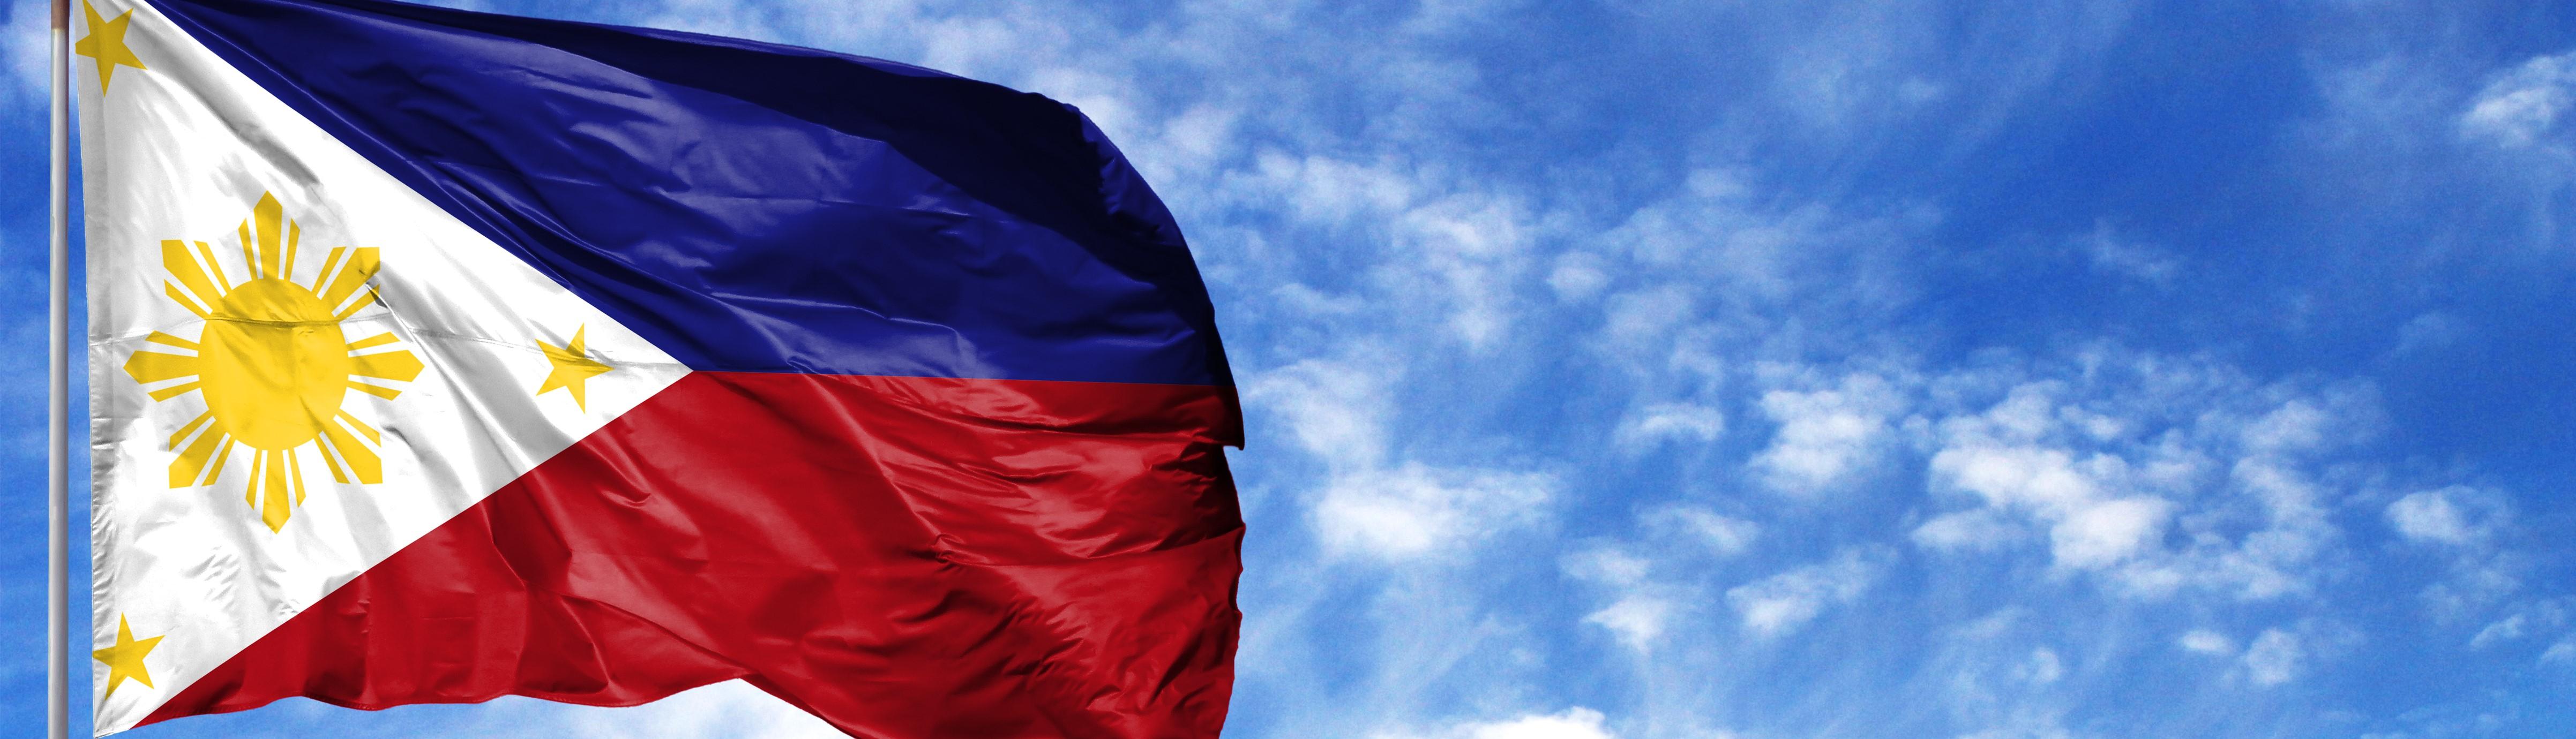 Filipino Flag